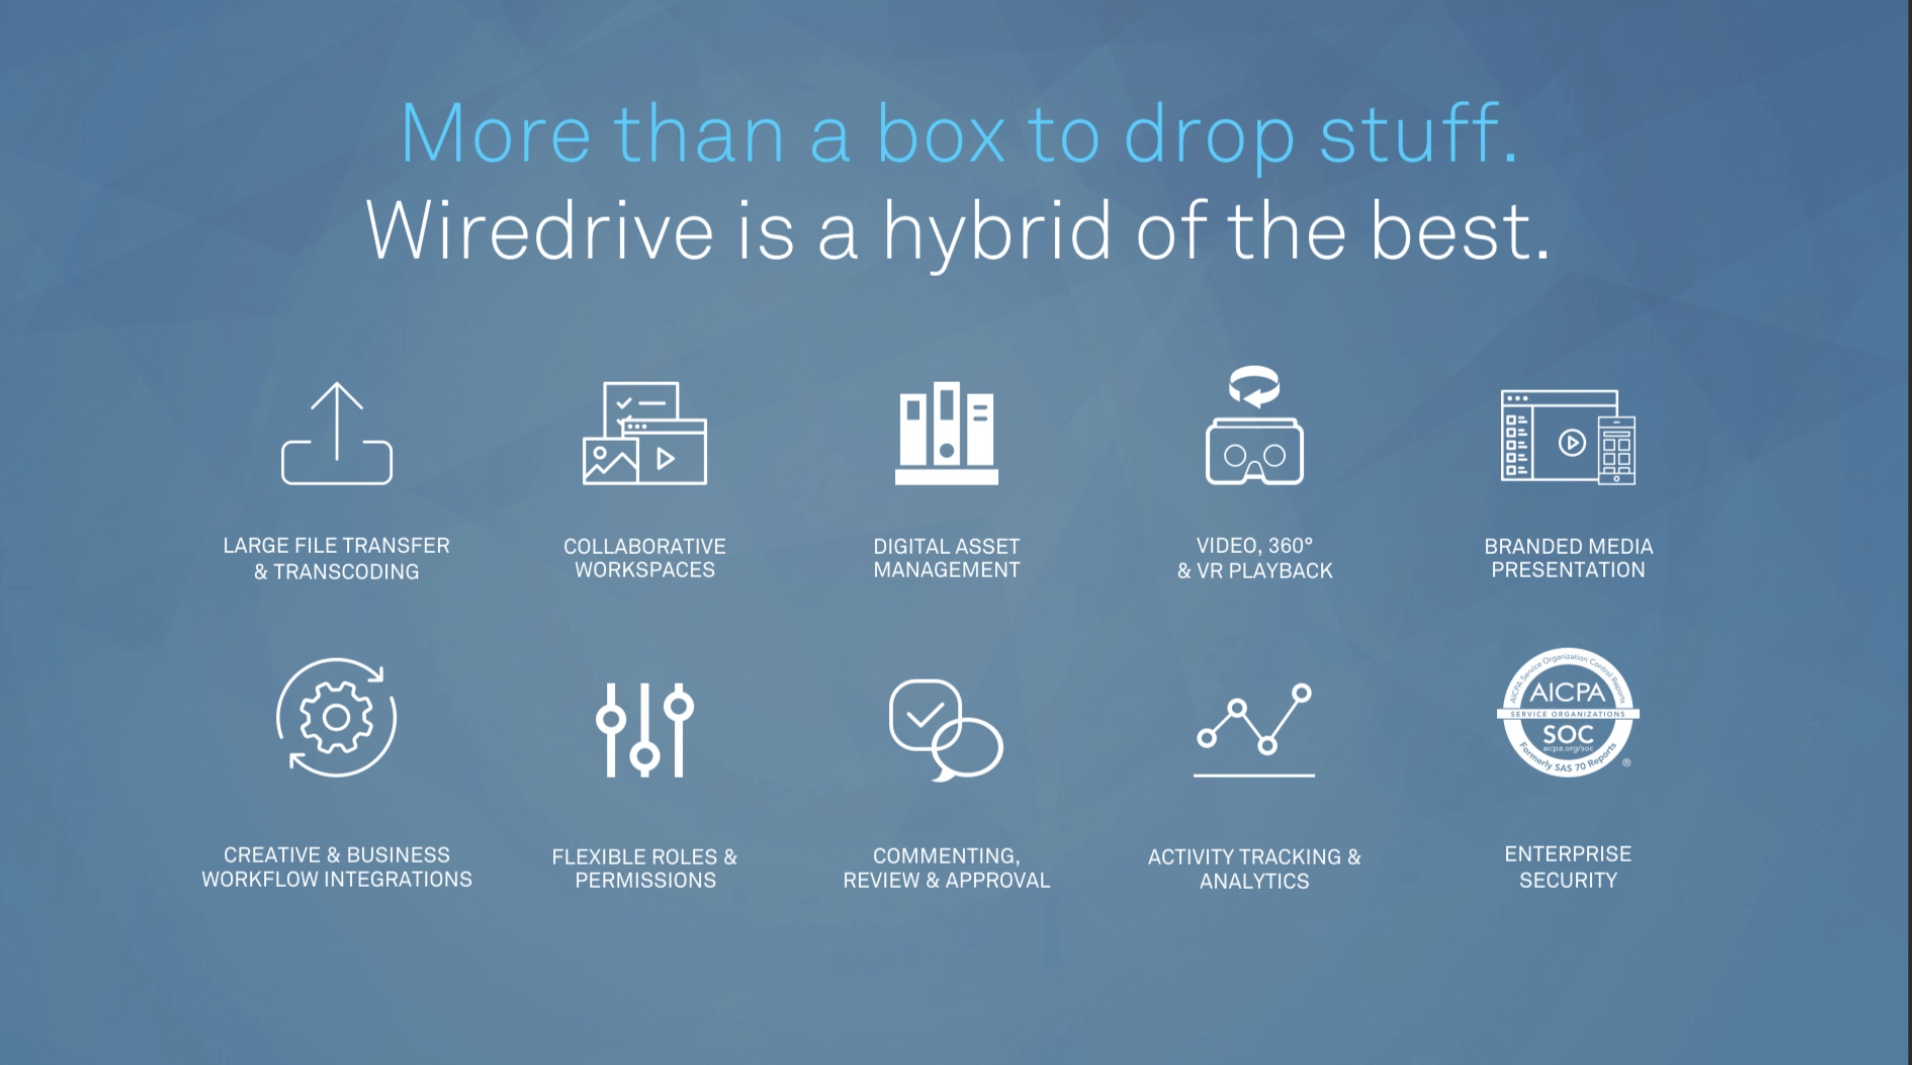 Wiredrive Demo - More than a box to drop stuff